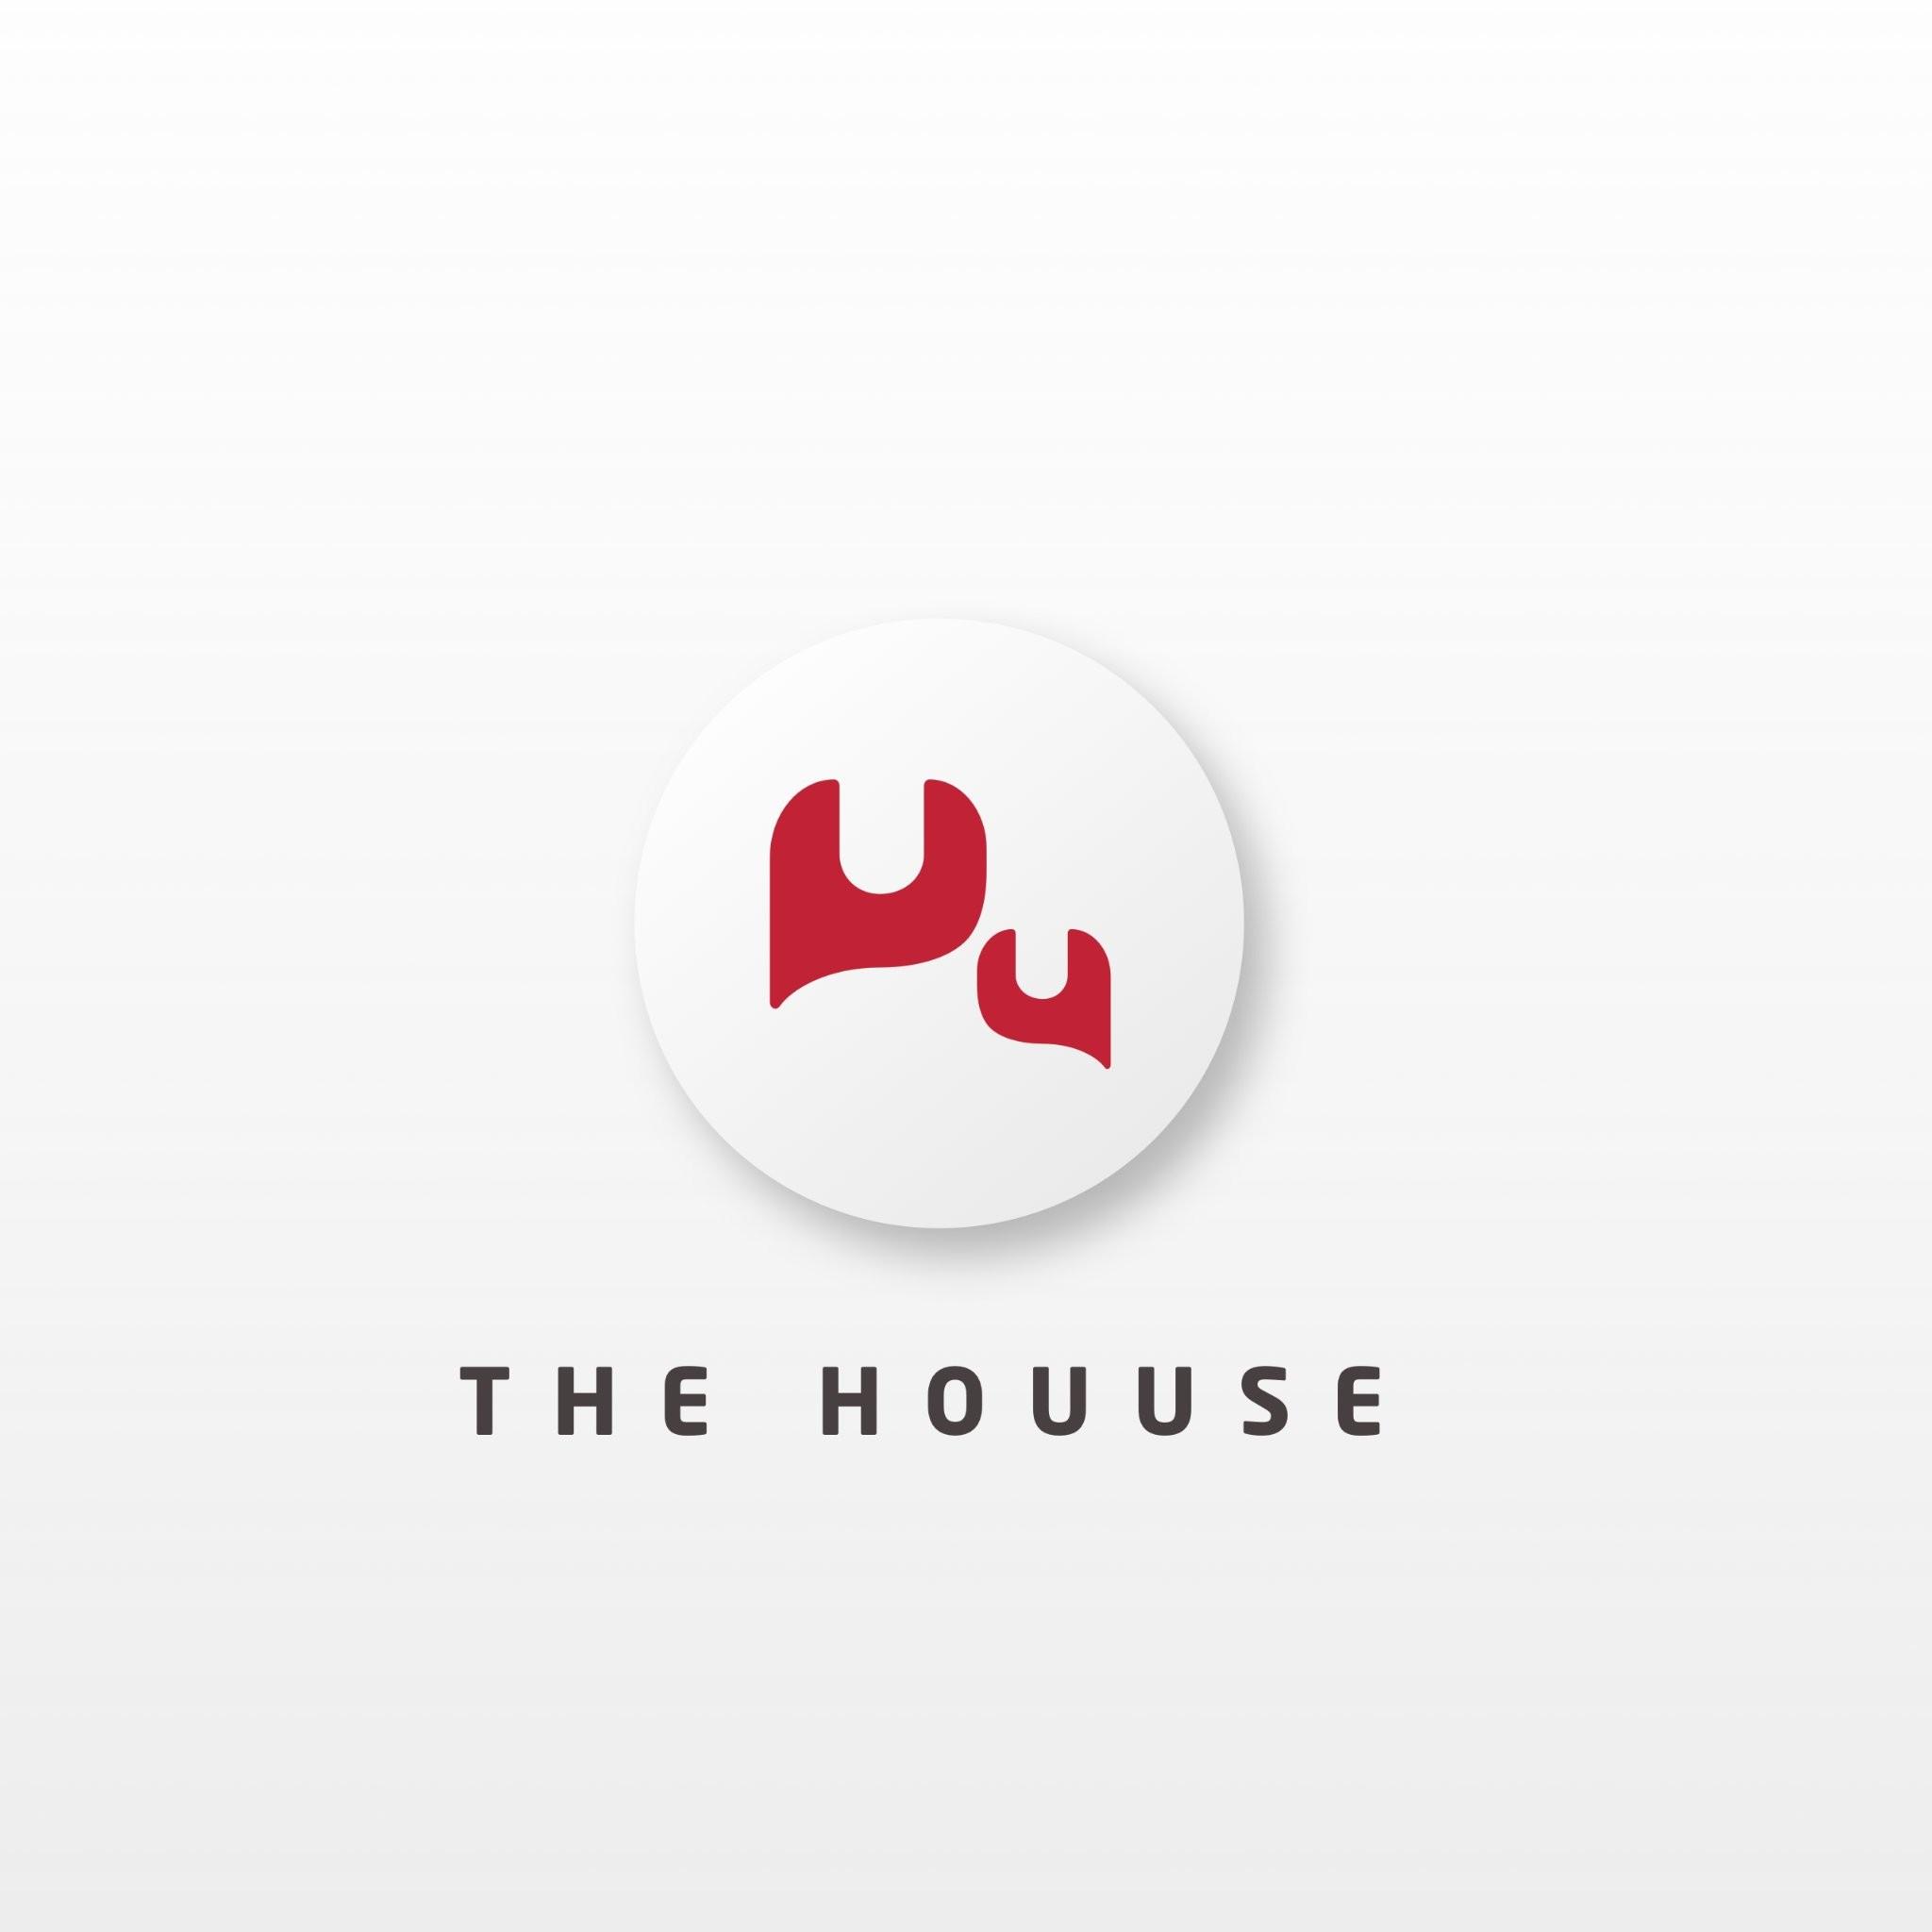 The Houuse